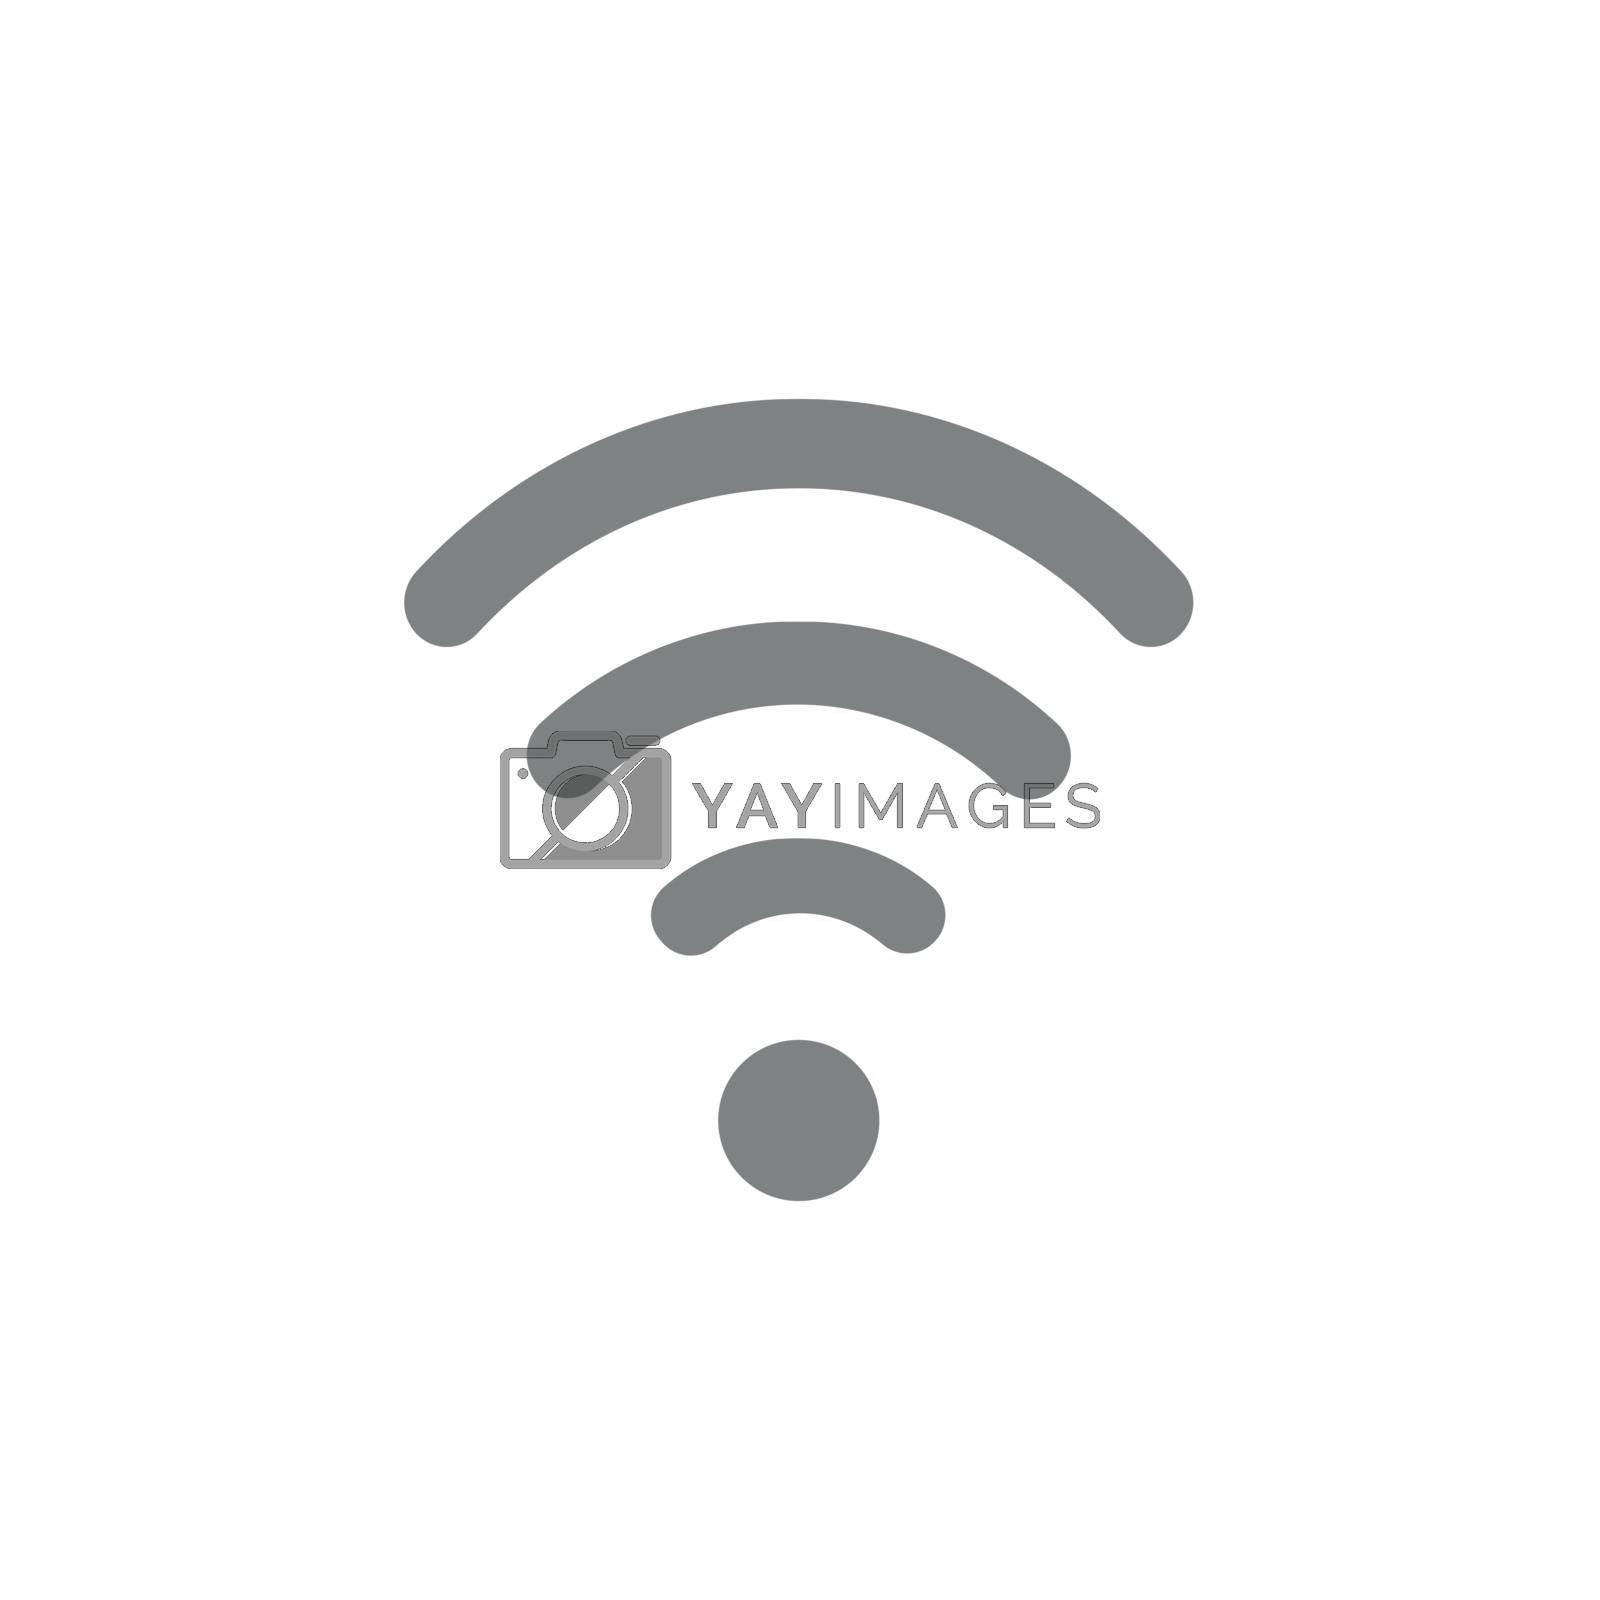 Flat design style vector illustration of grey wifi symbol icon on white background.